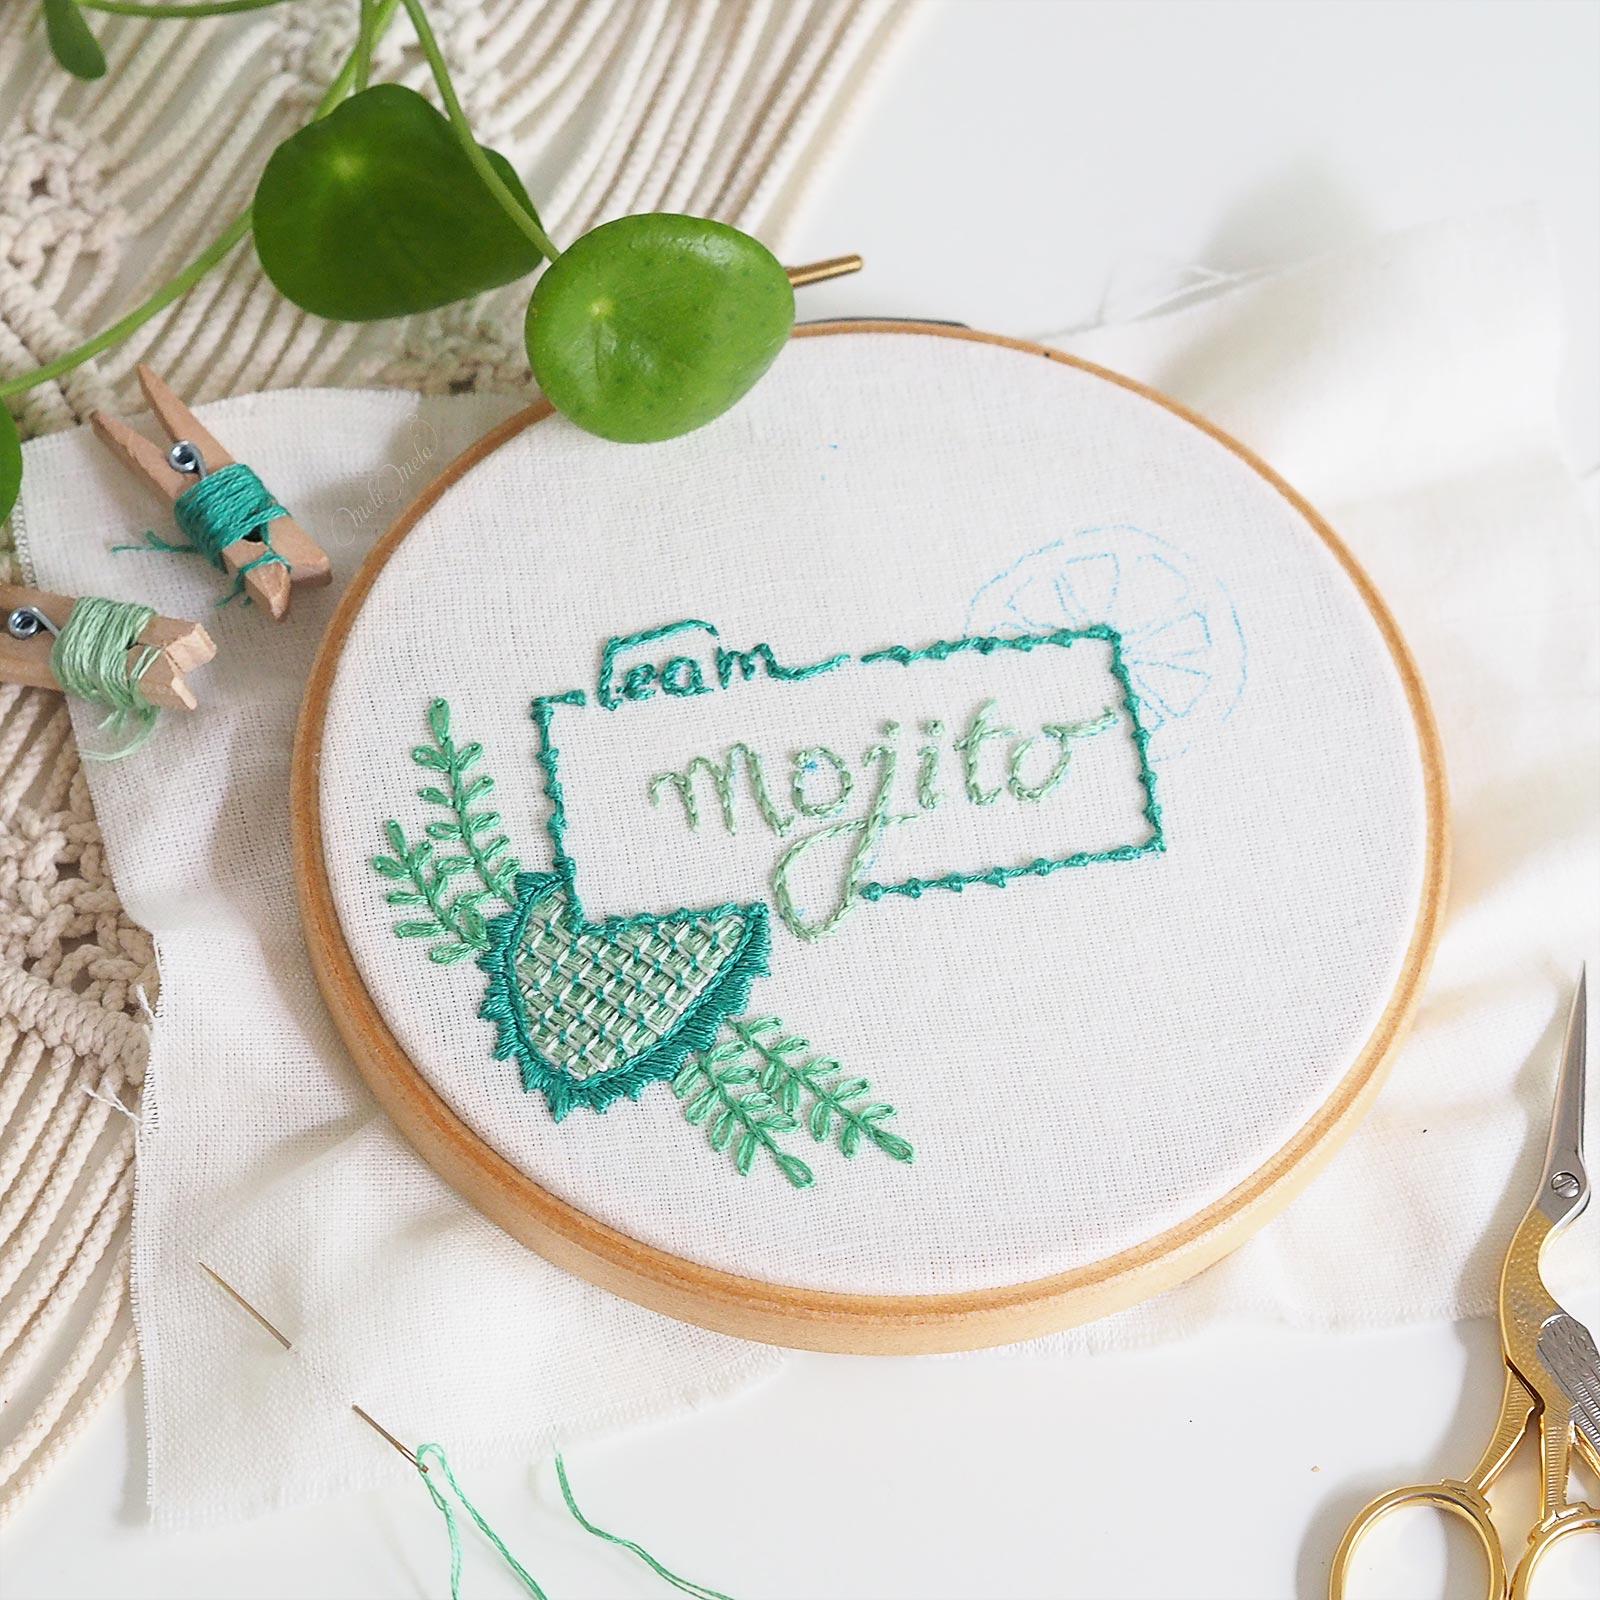 broderie palestrina stitch embroidery calligraphie mojito auverasoie mouliné dmc laboutiquedemelimelo